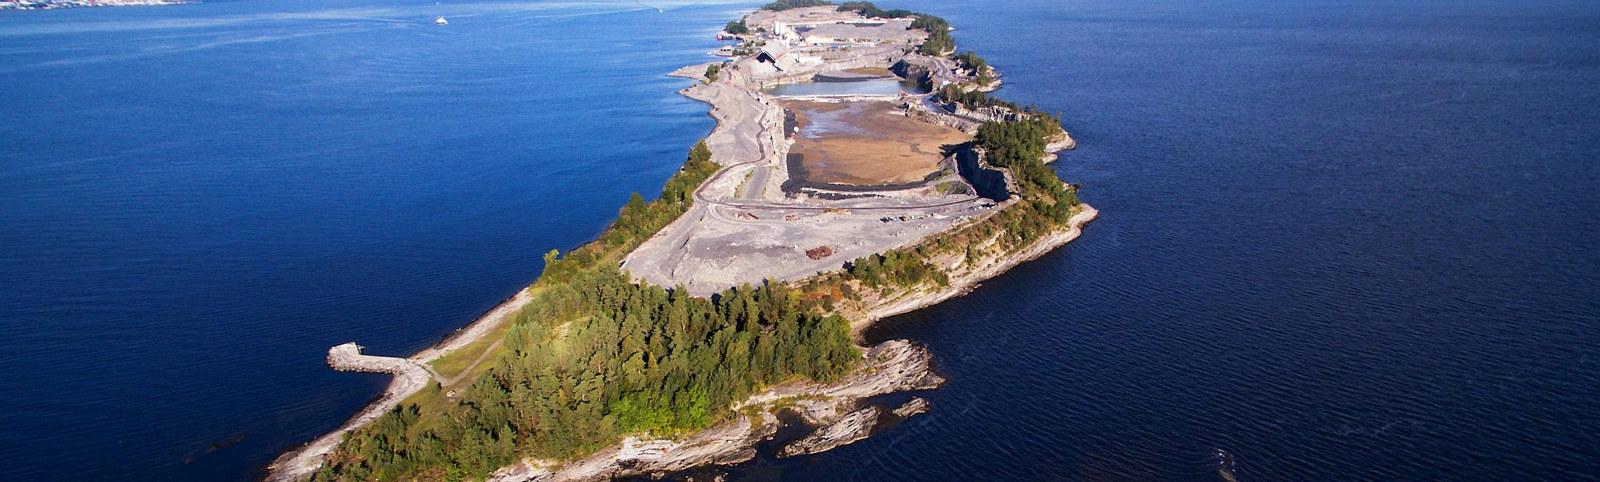 Langøya utenfor Holmestrand. Foto: NOAH